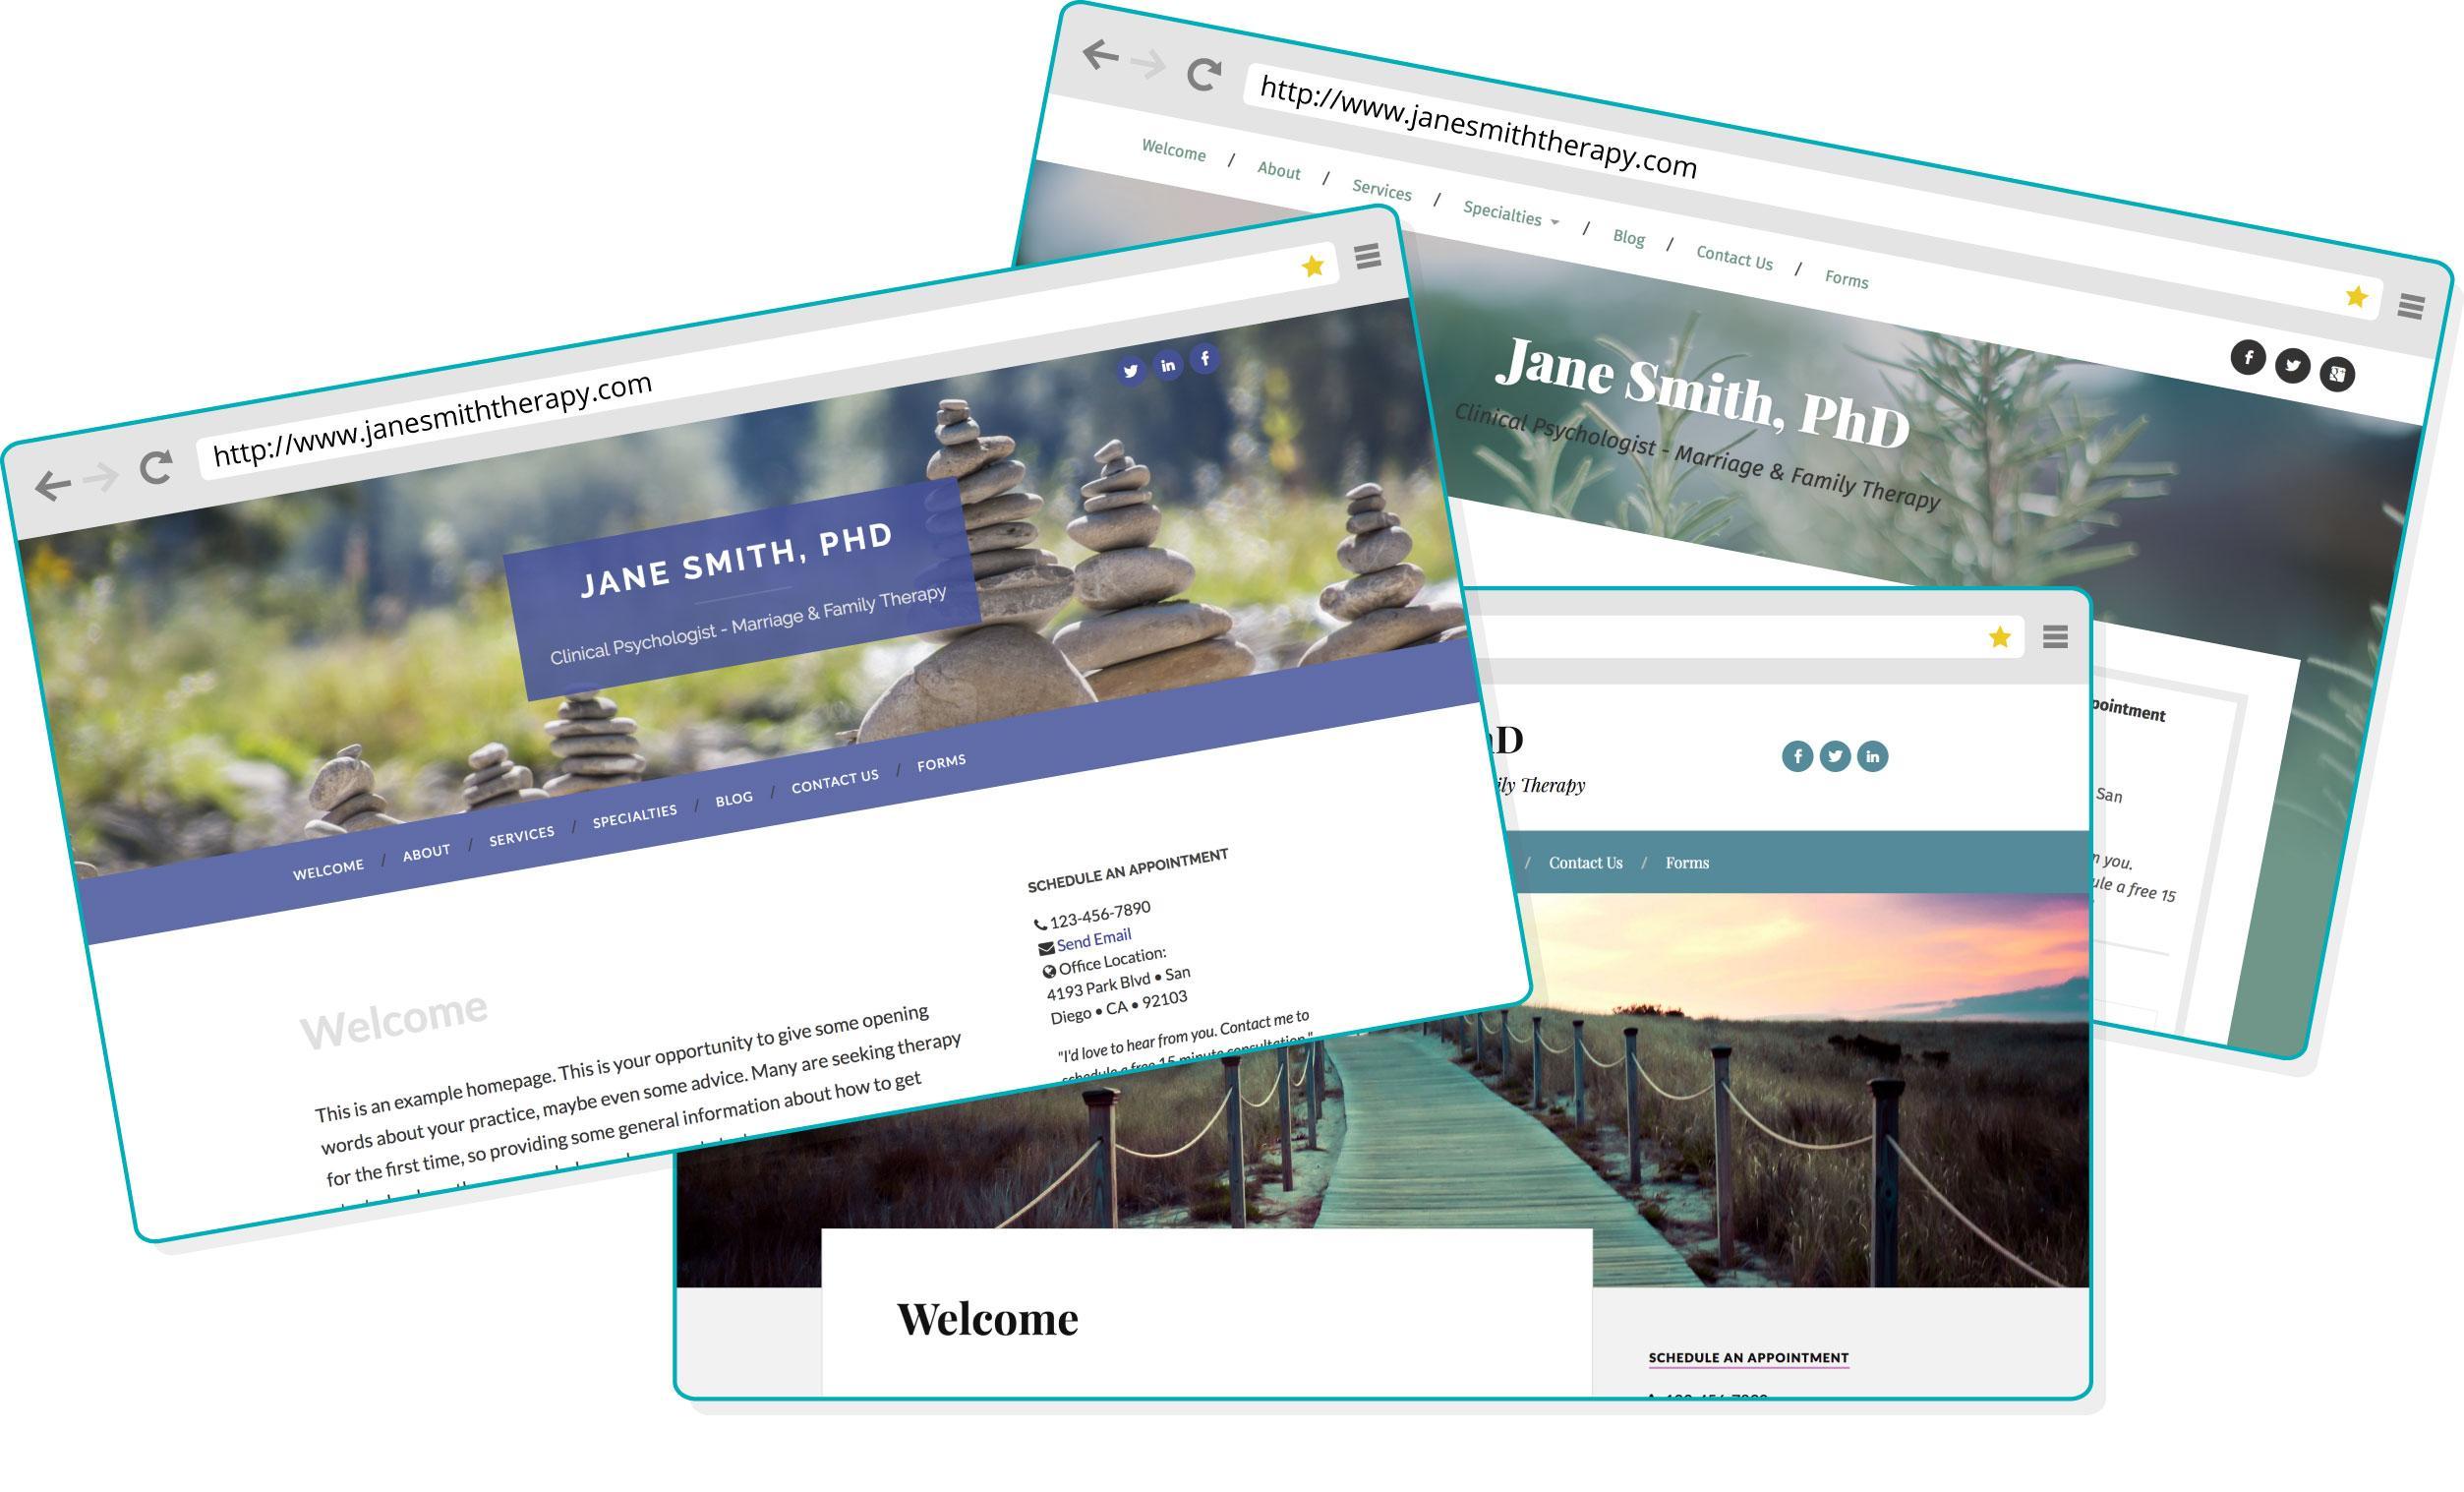 Free Therapist Websites